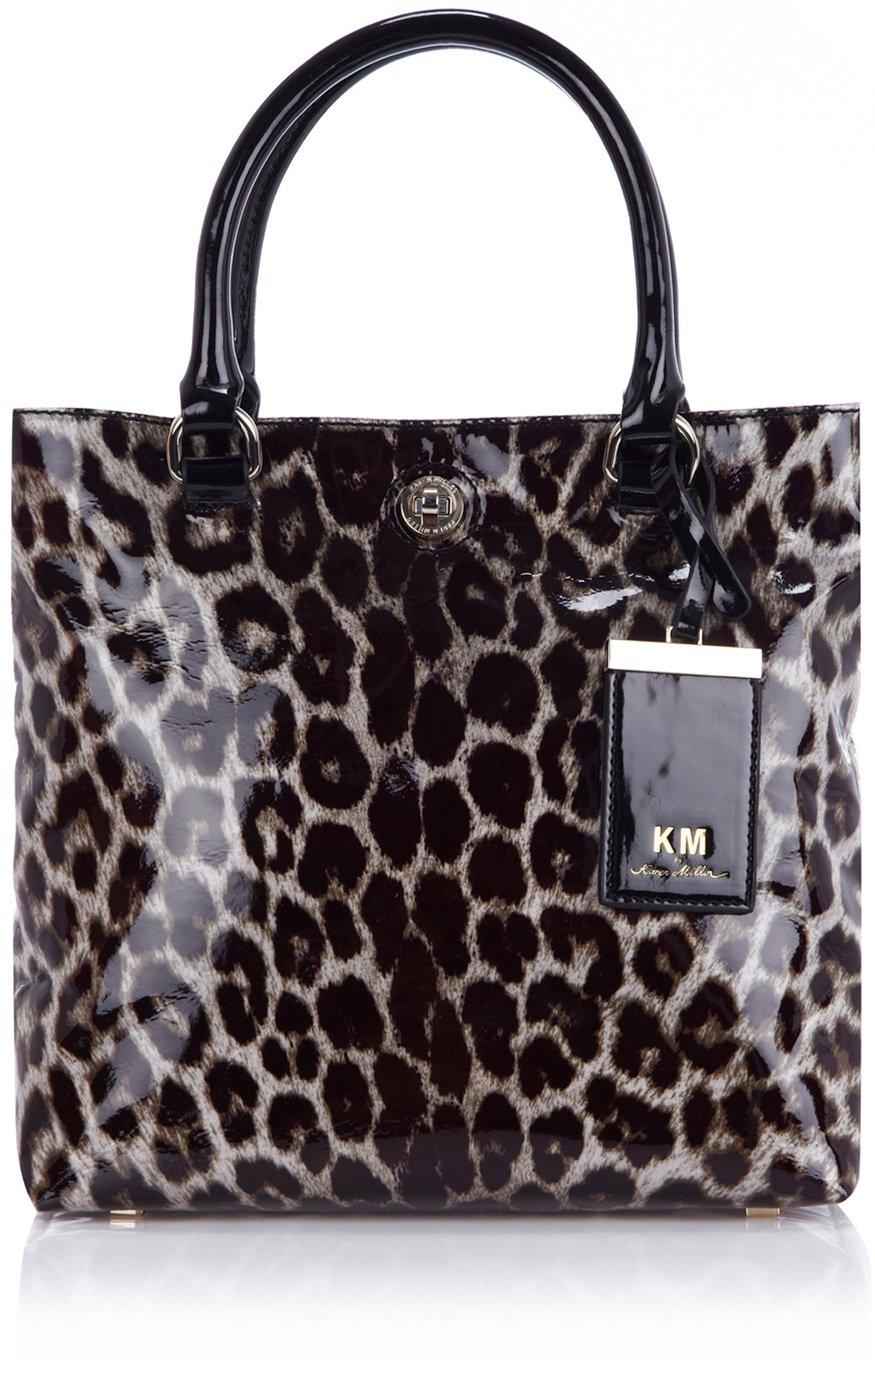 61531960ff Karen Millen Patent Leopard Print Tote - Lyst